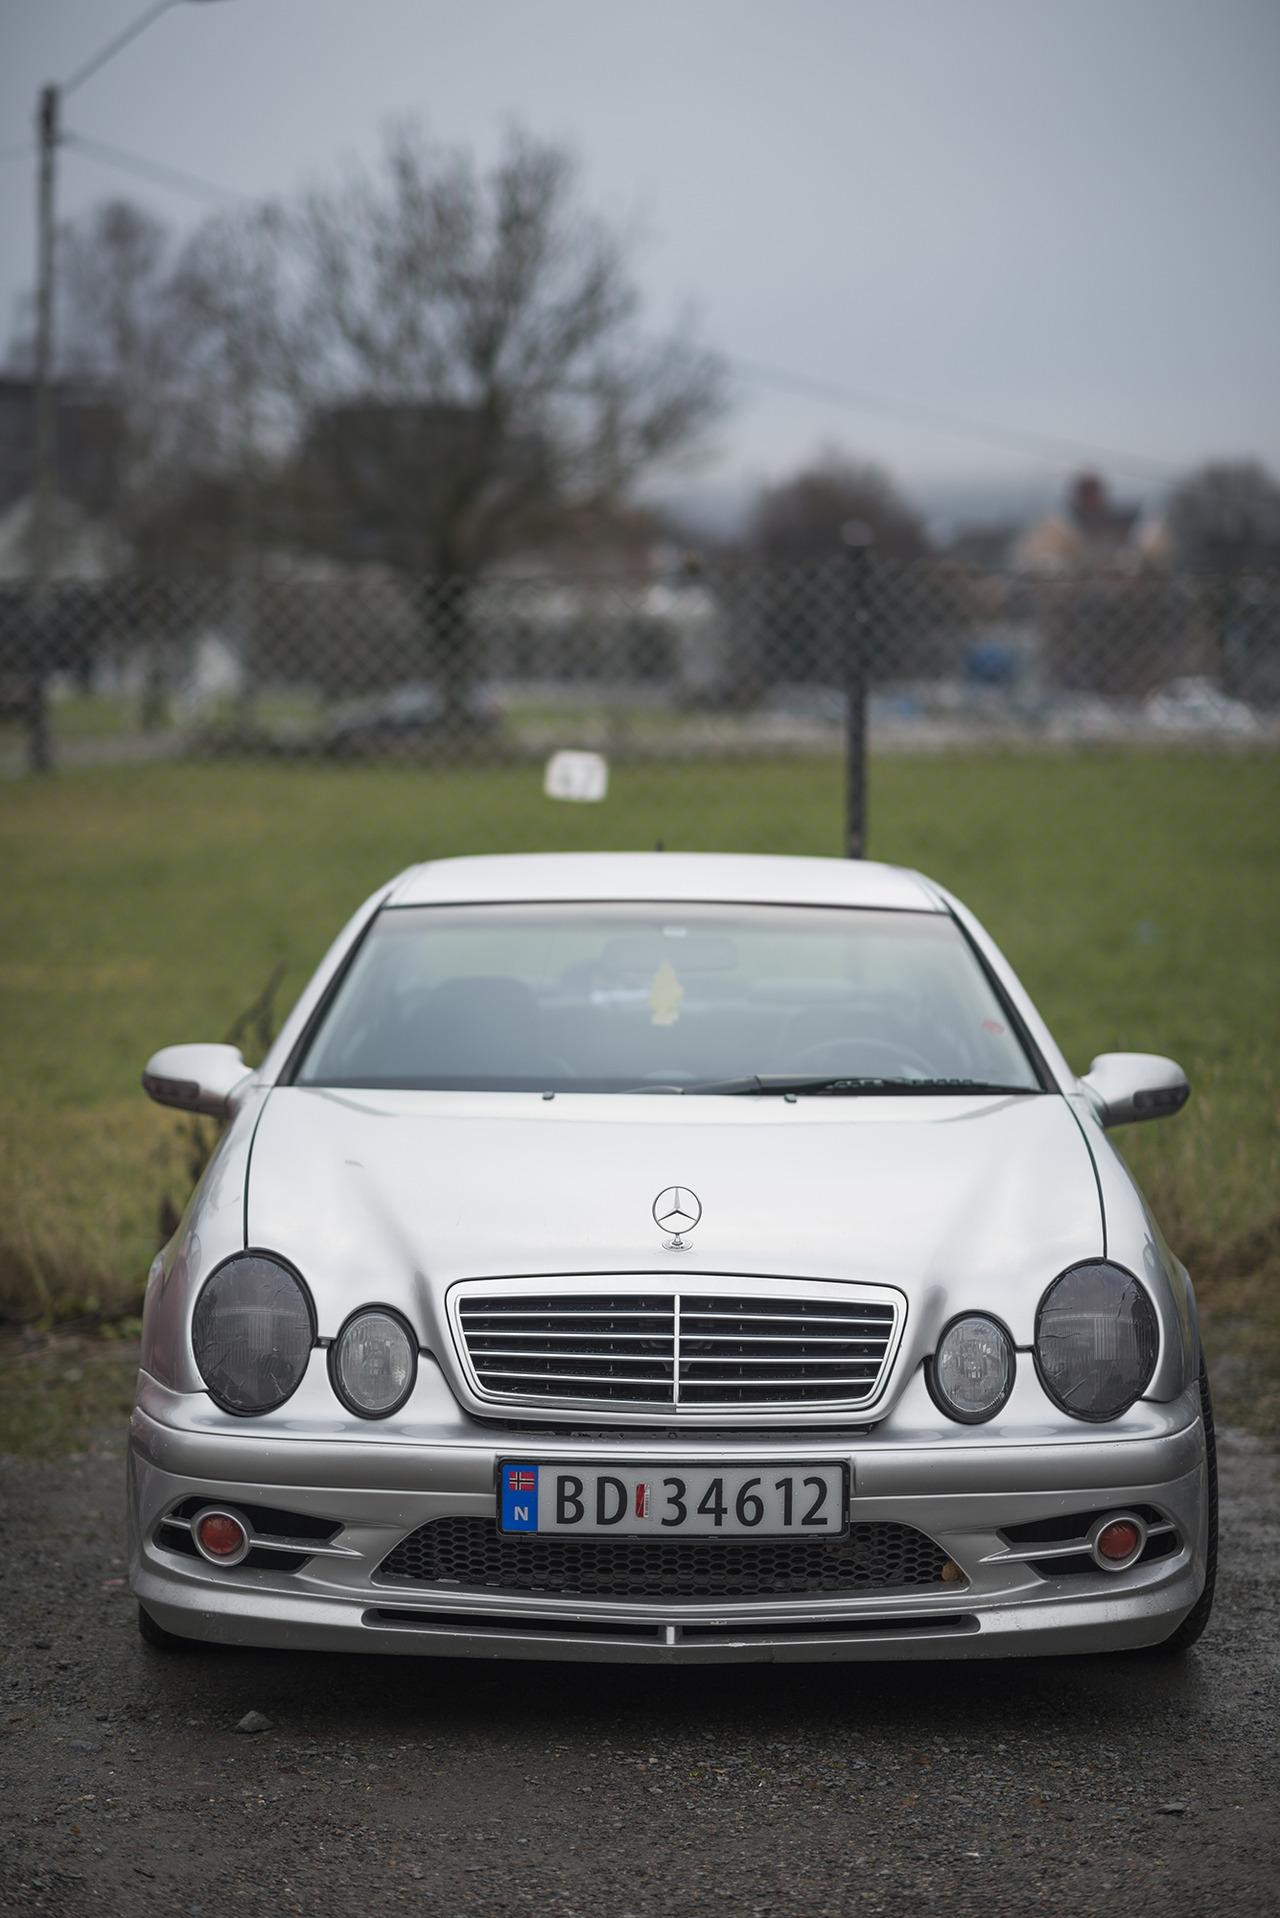 Mercedes, 303/366.